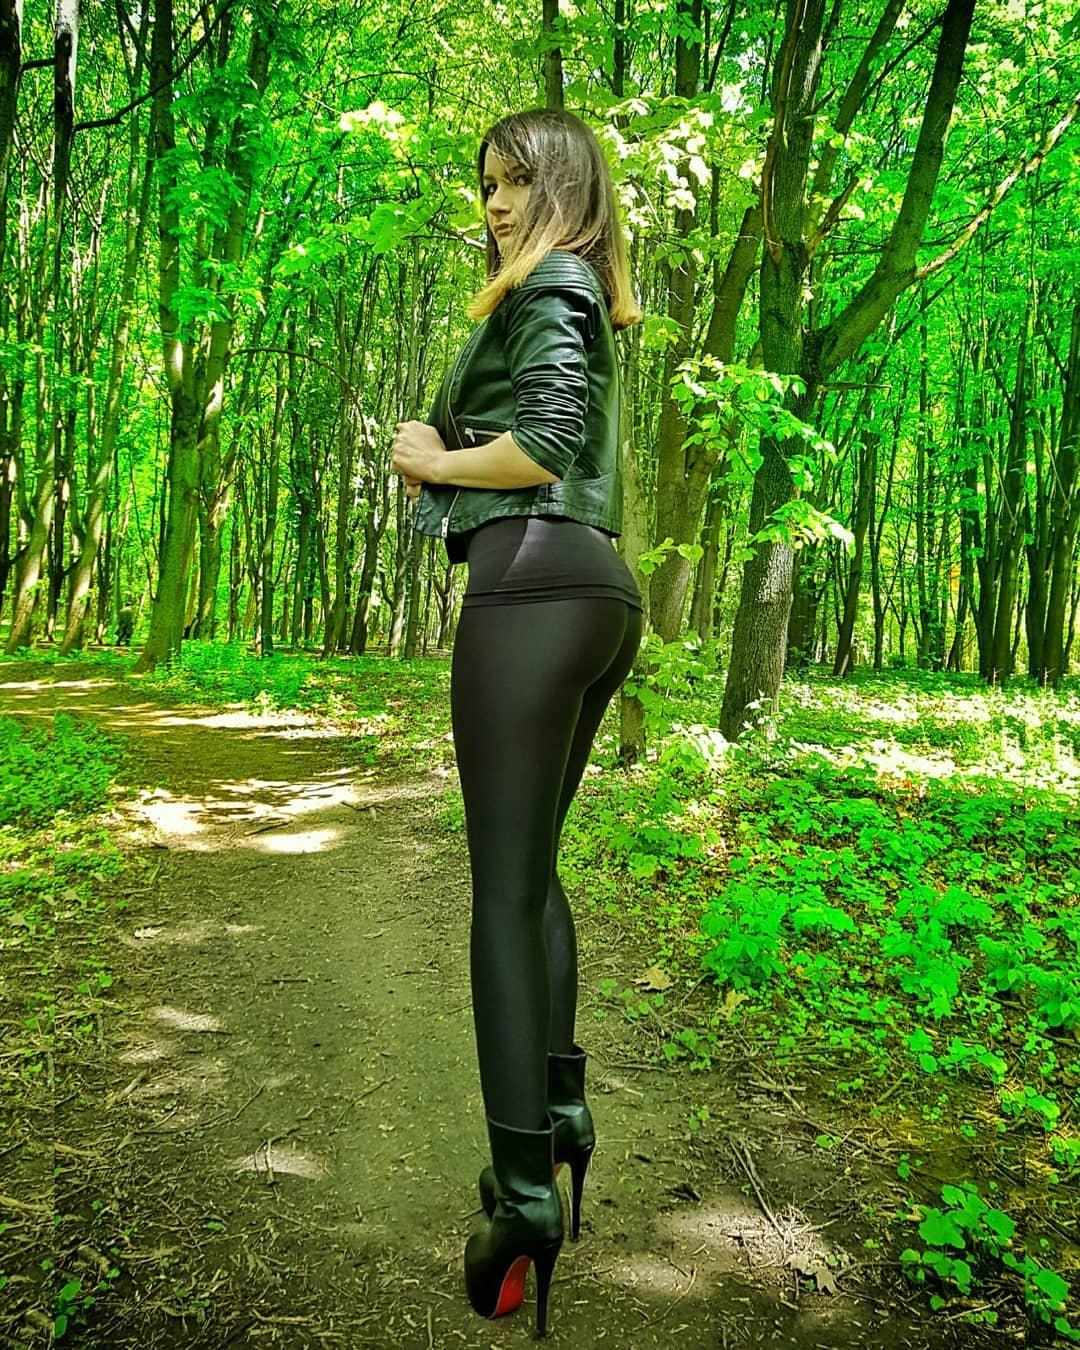 Olga-Madych-Wallpapers-Insta-Fit-Bio-5